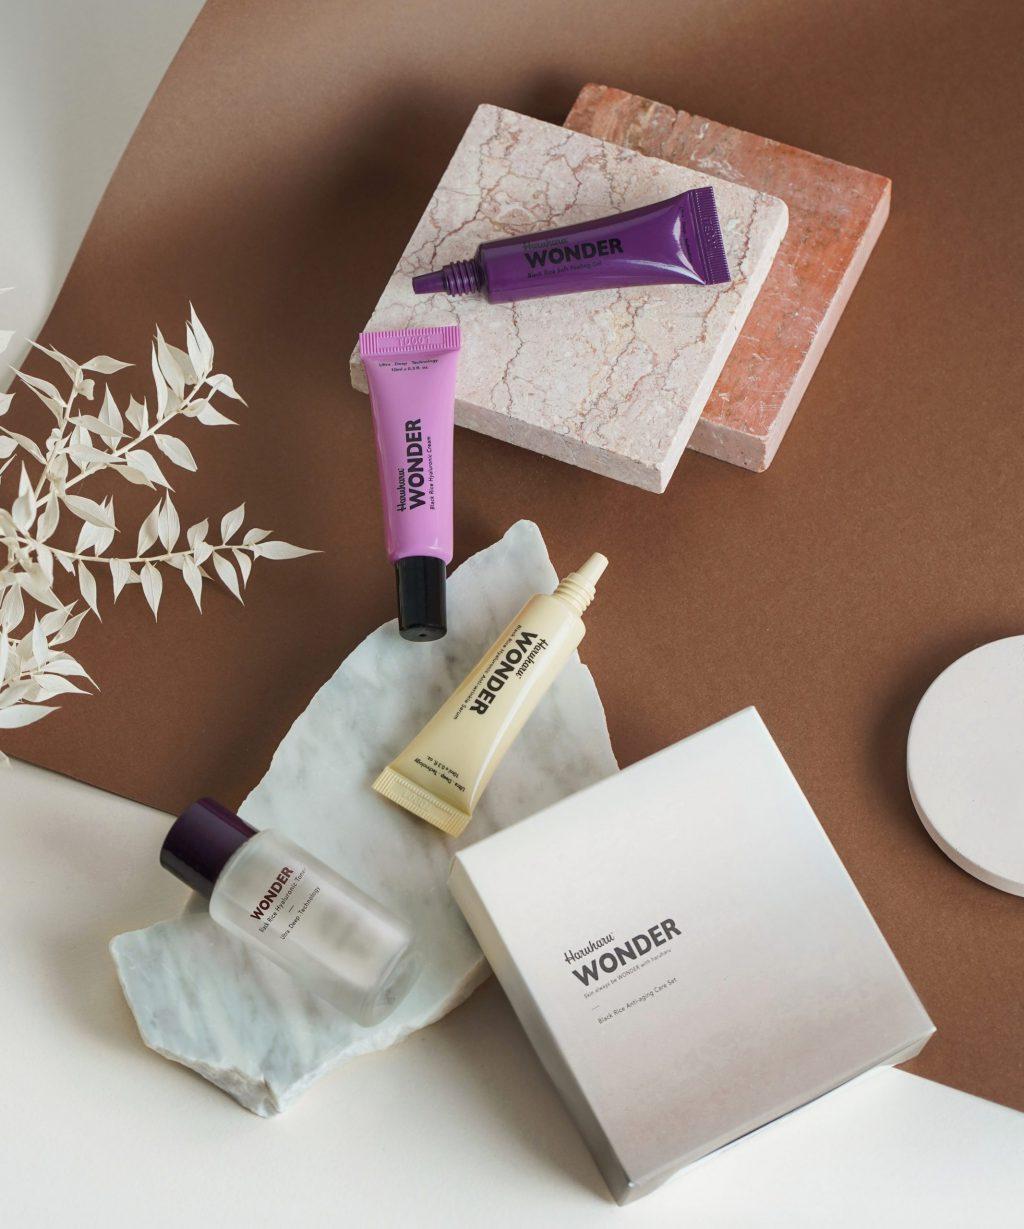 WONDER Black Rice Miniature Set – Skin Care For Anti-Aging